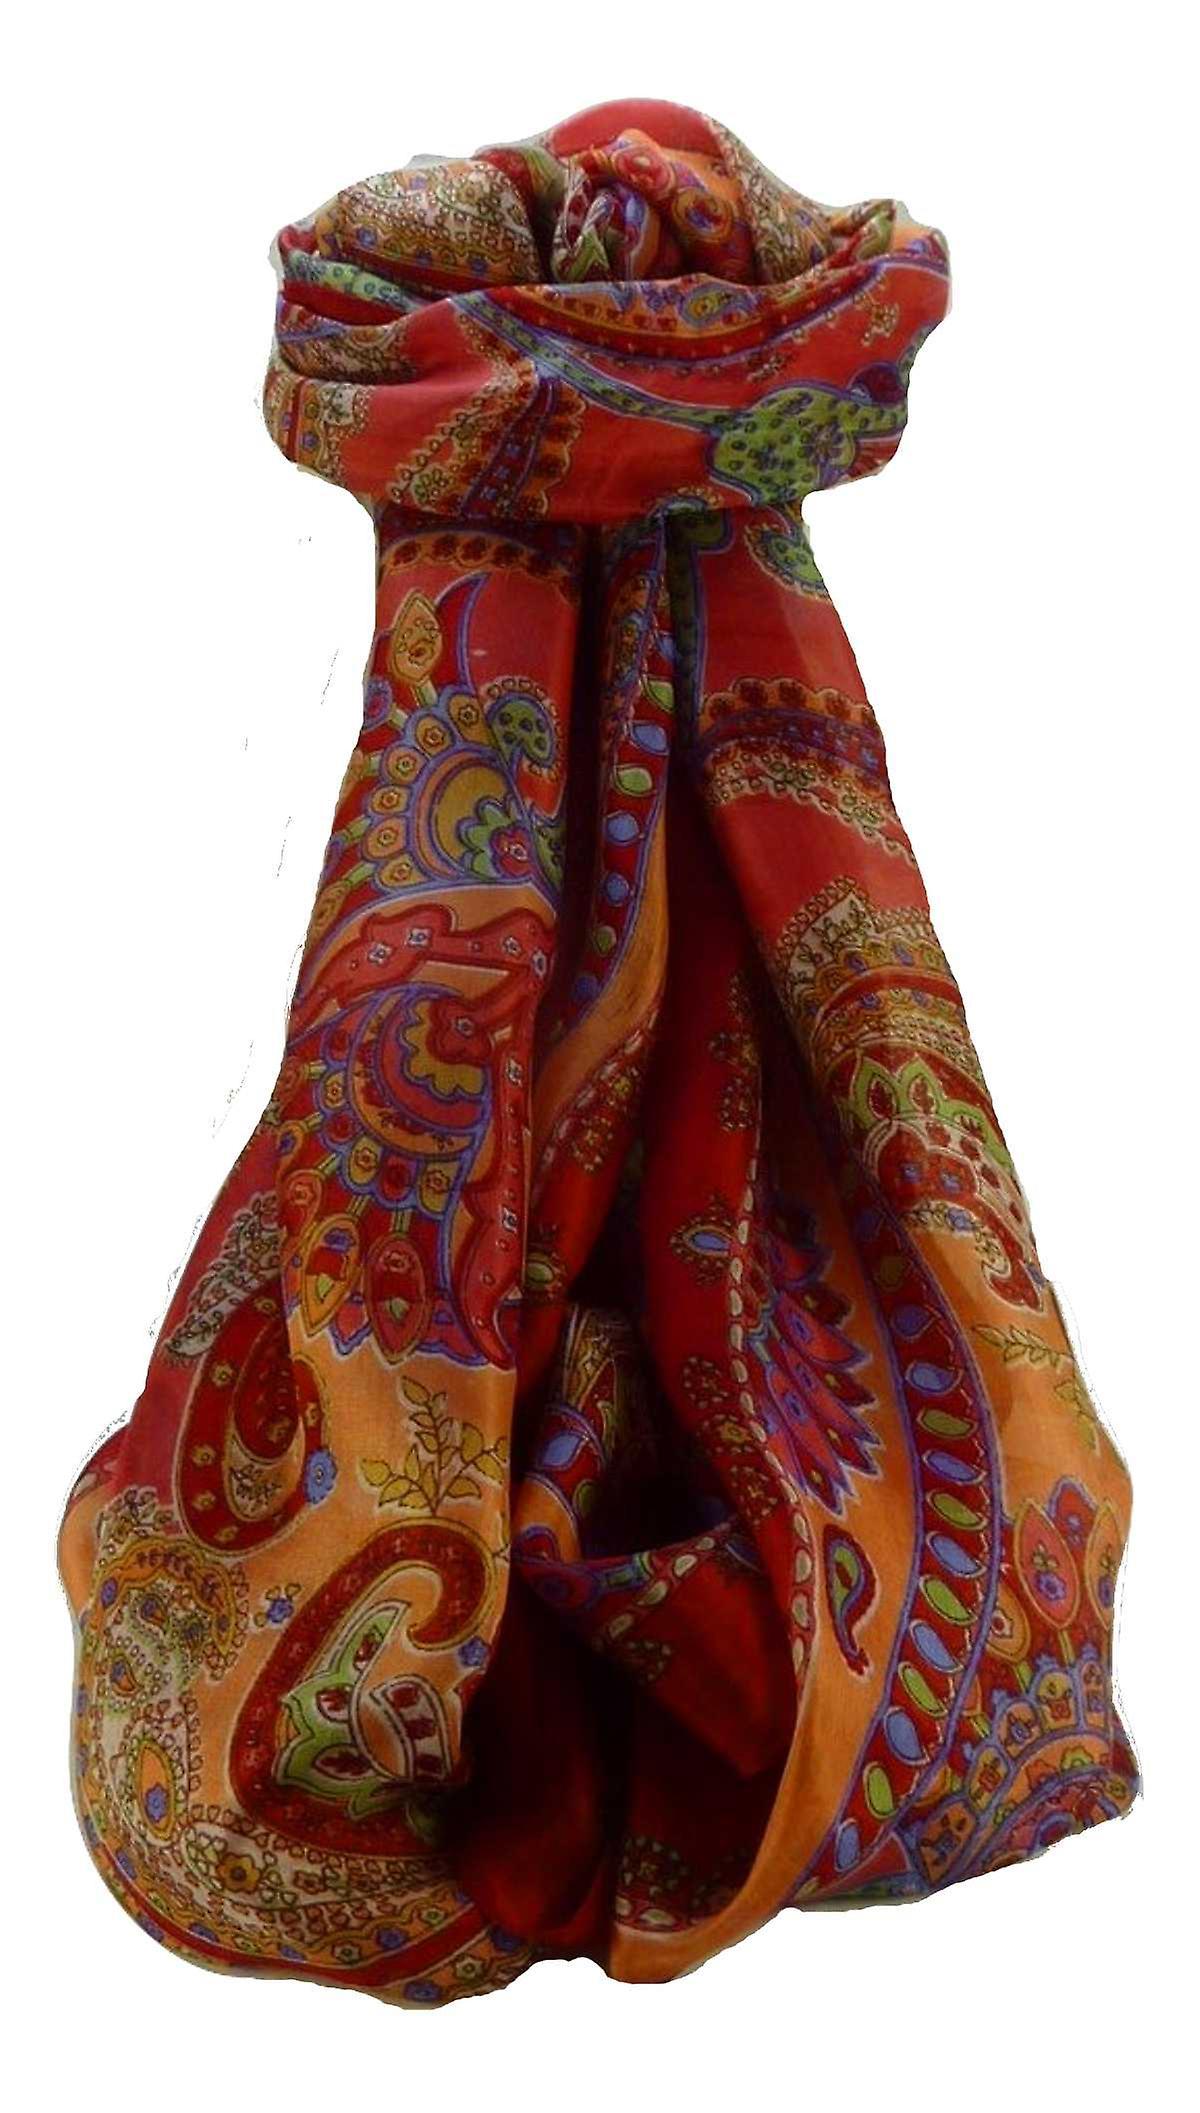 Mulberry Silk Traditional Long Scarf Shipra Scarlet by Pashmina & Silk